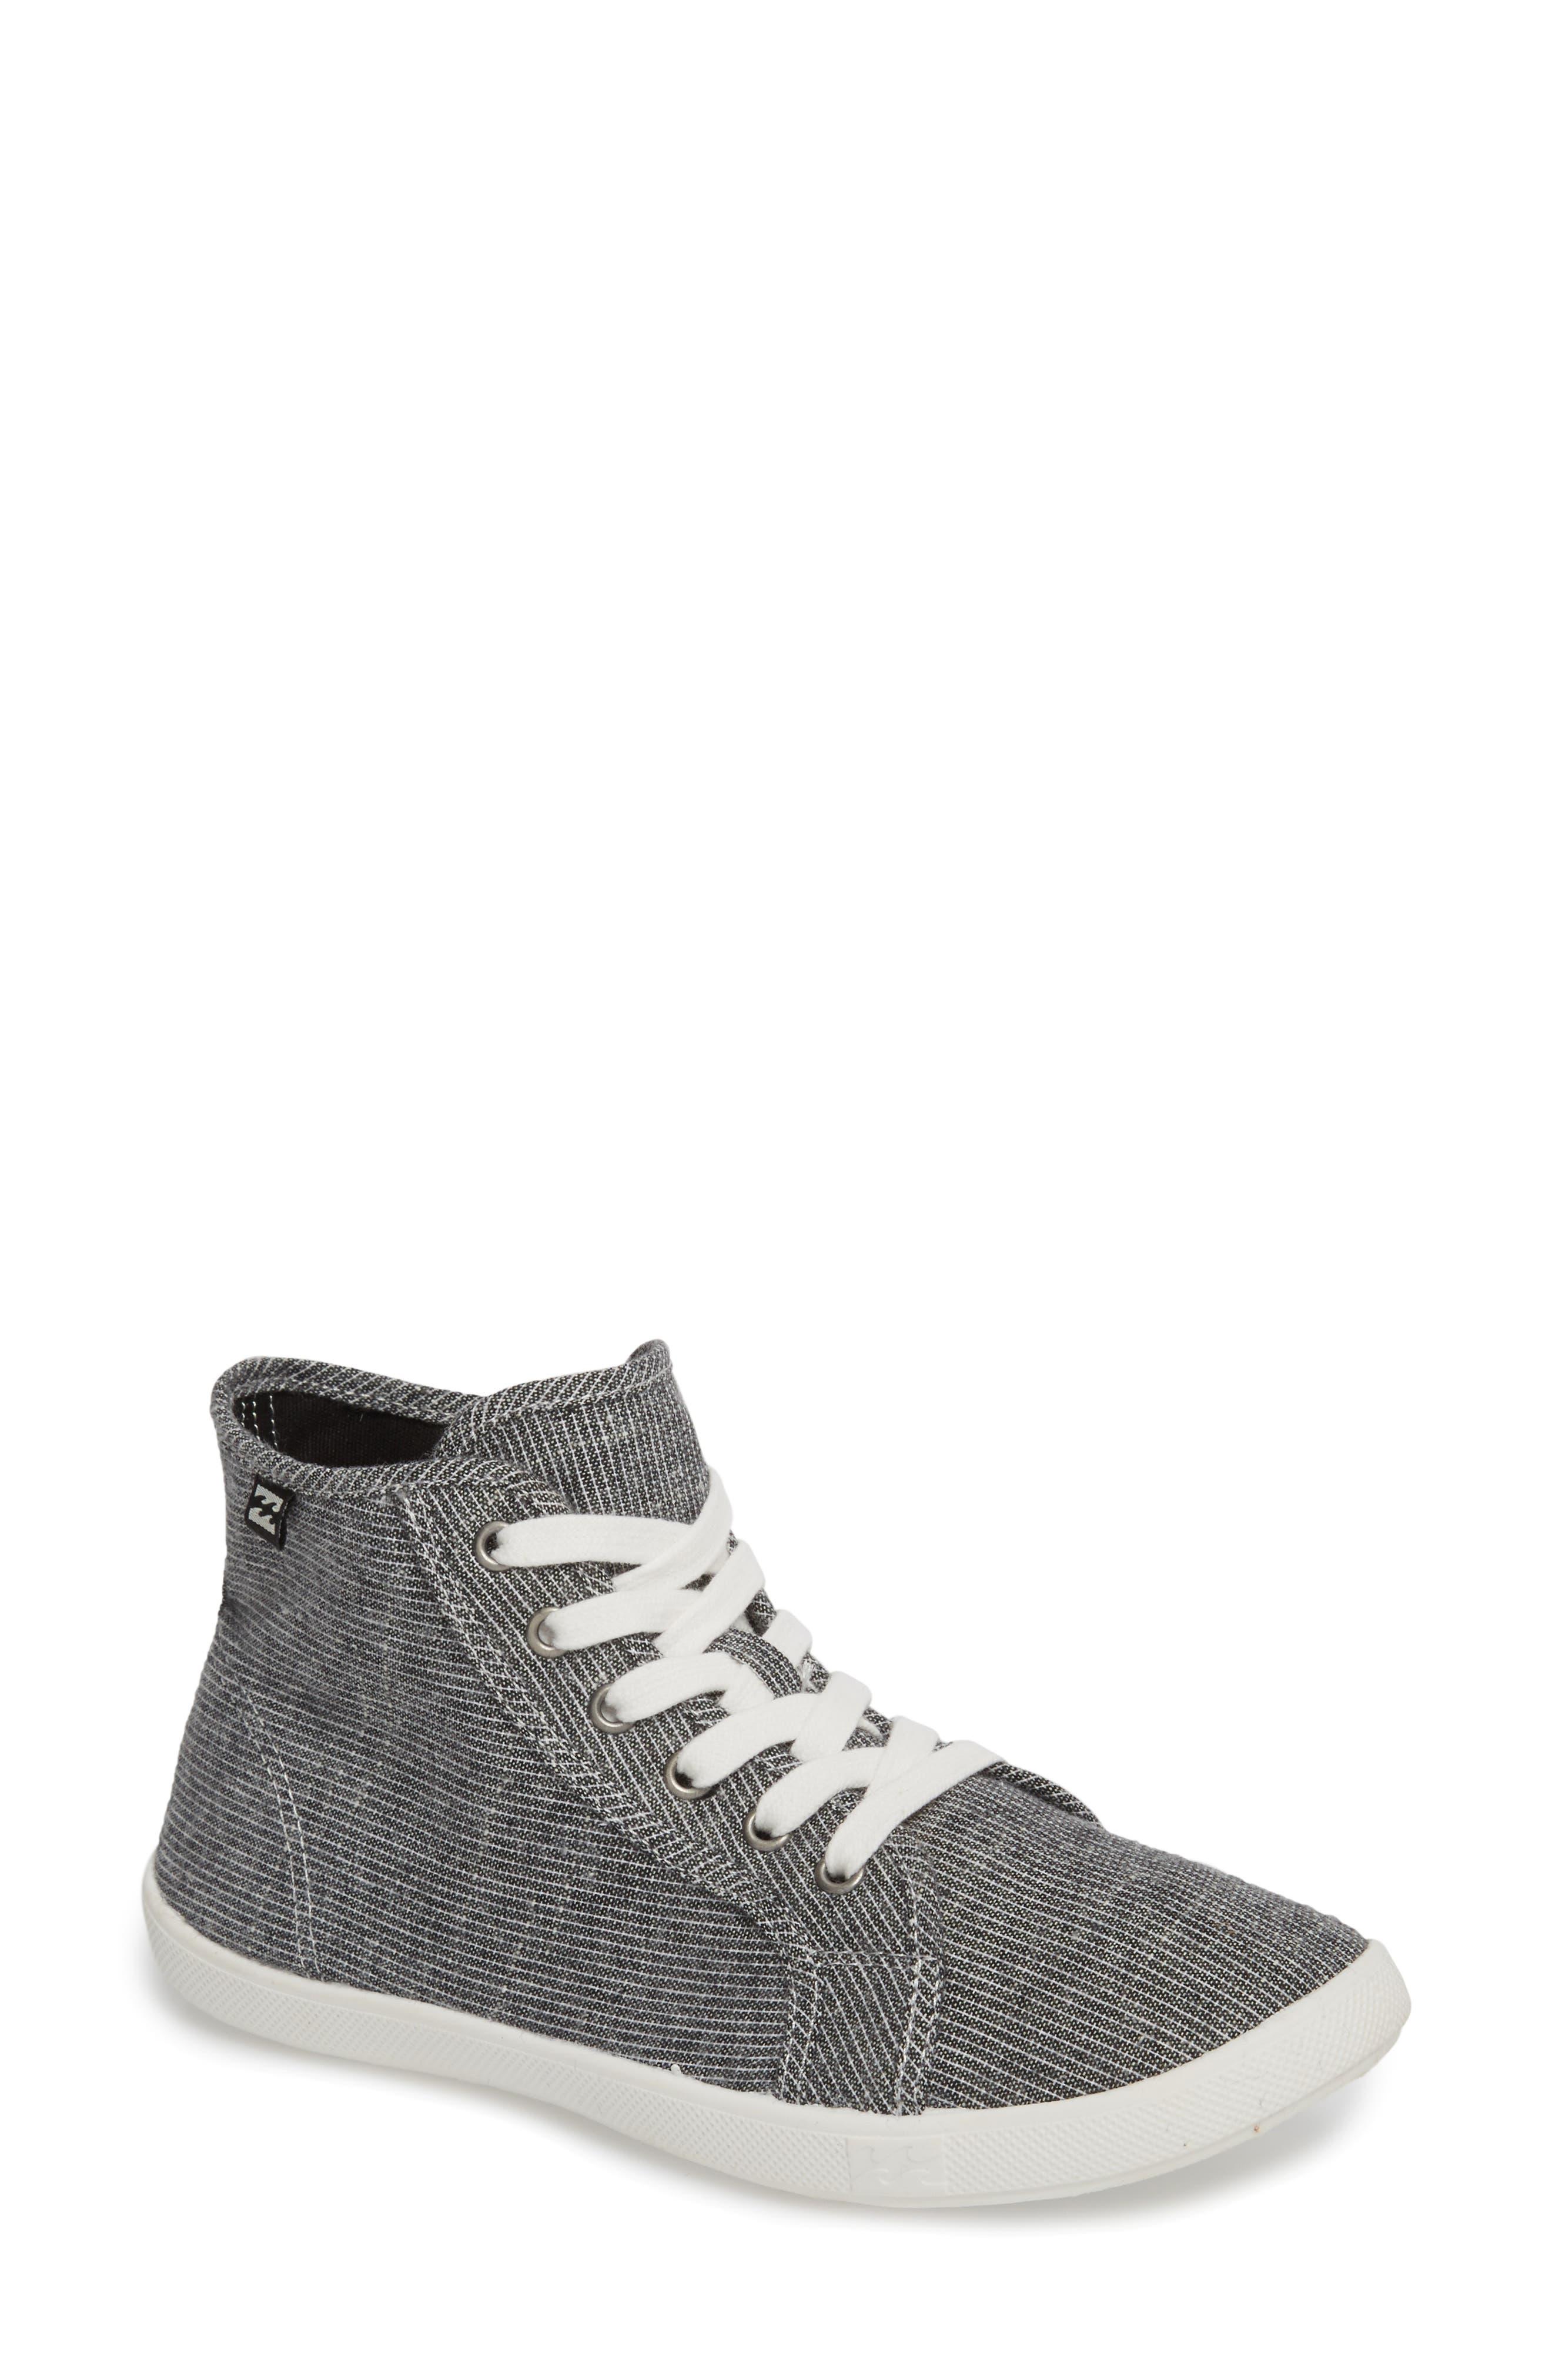 Phoenix Sneaker,                             Main thumbnail 1, color,